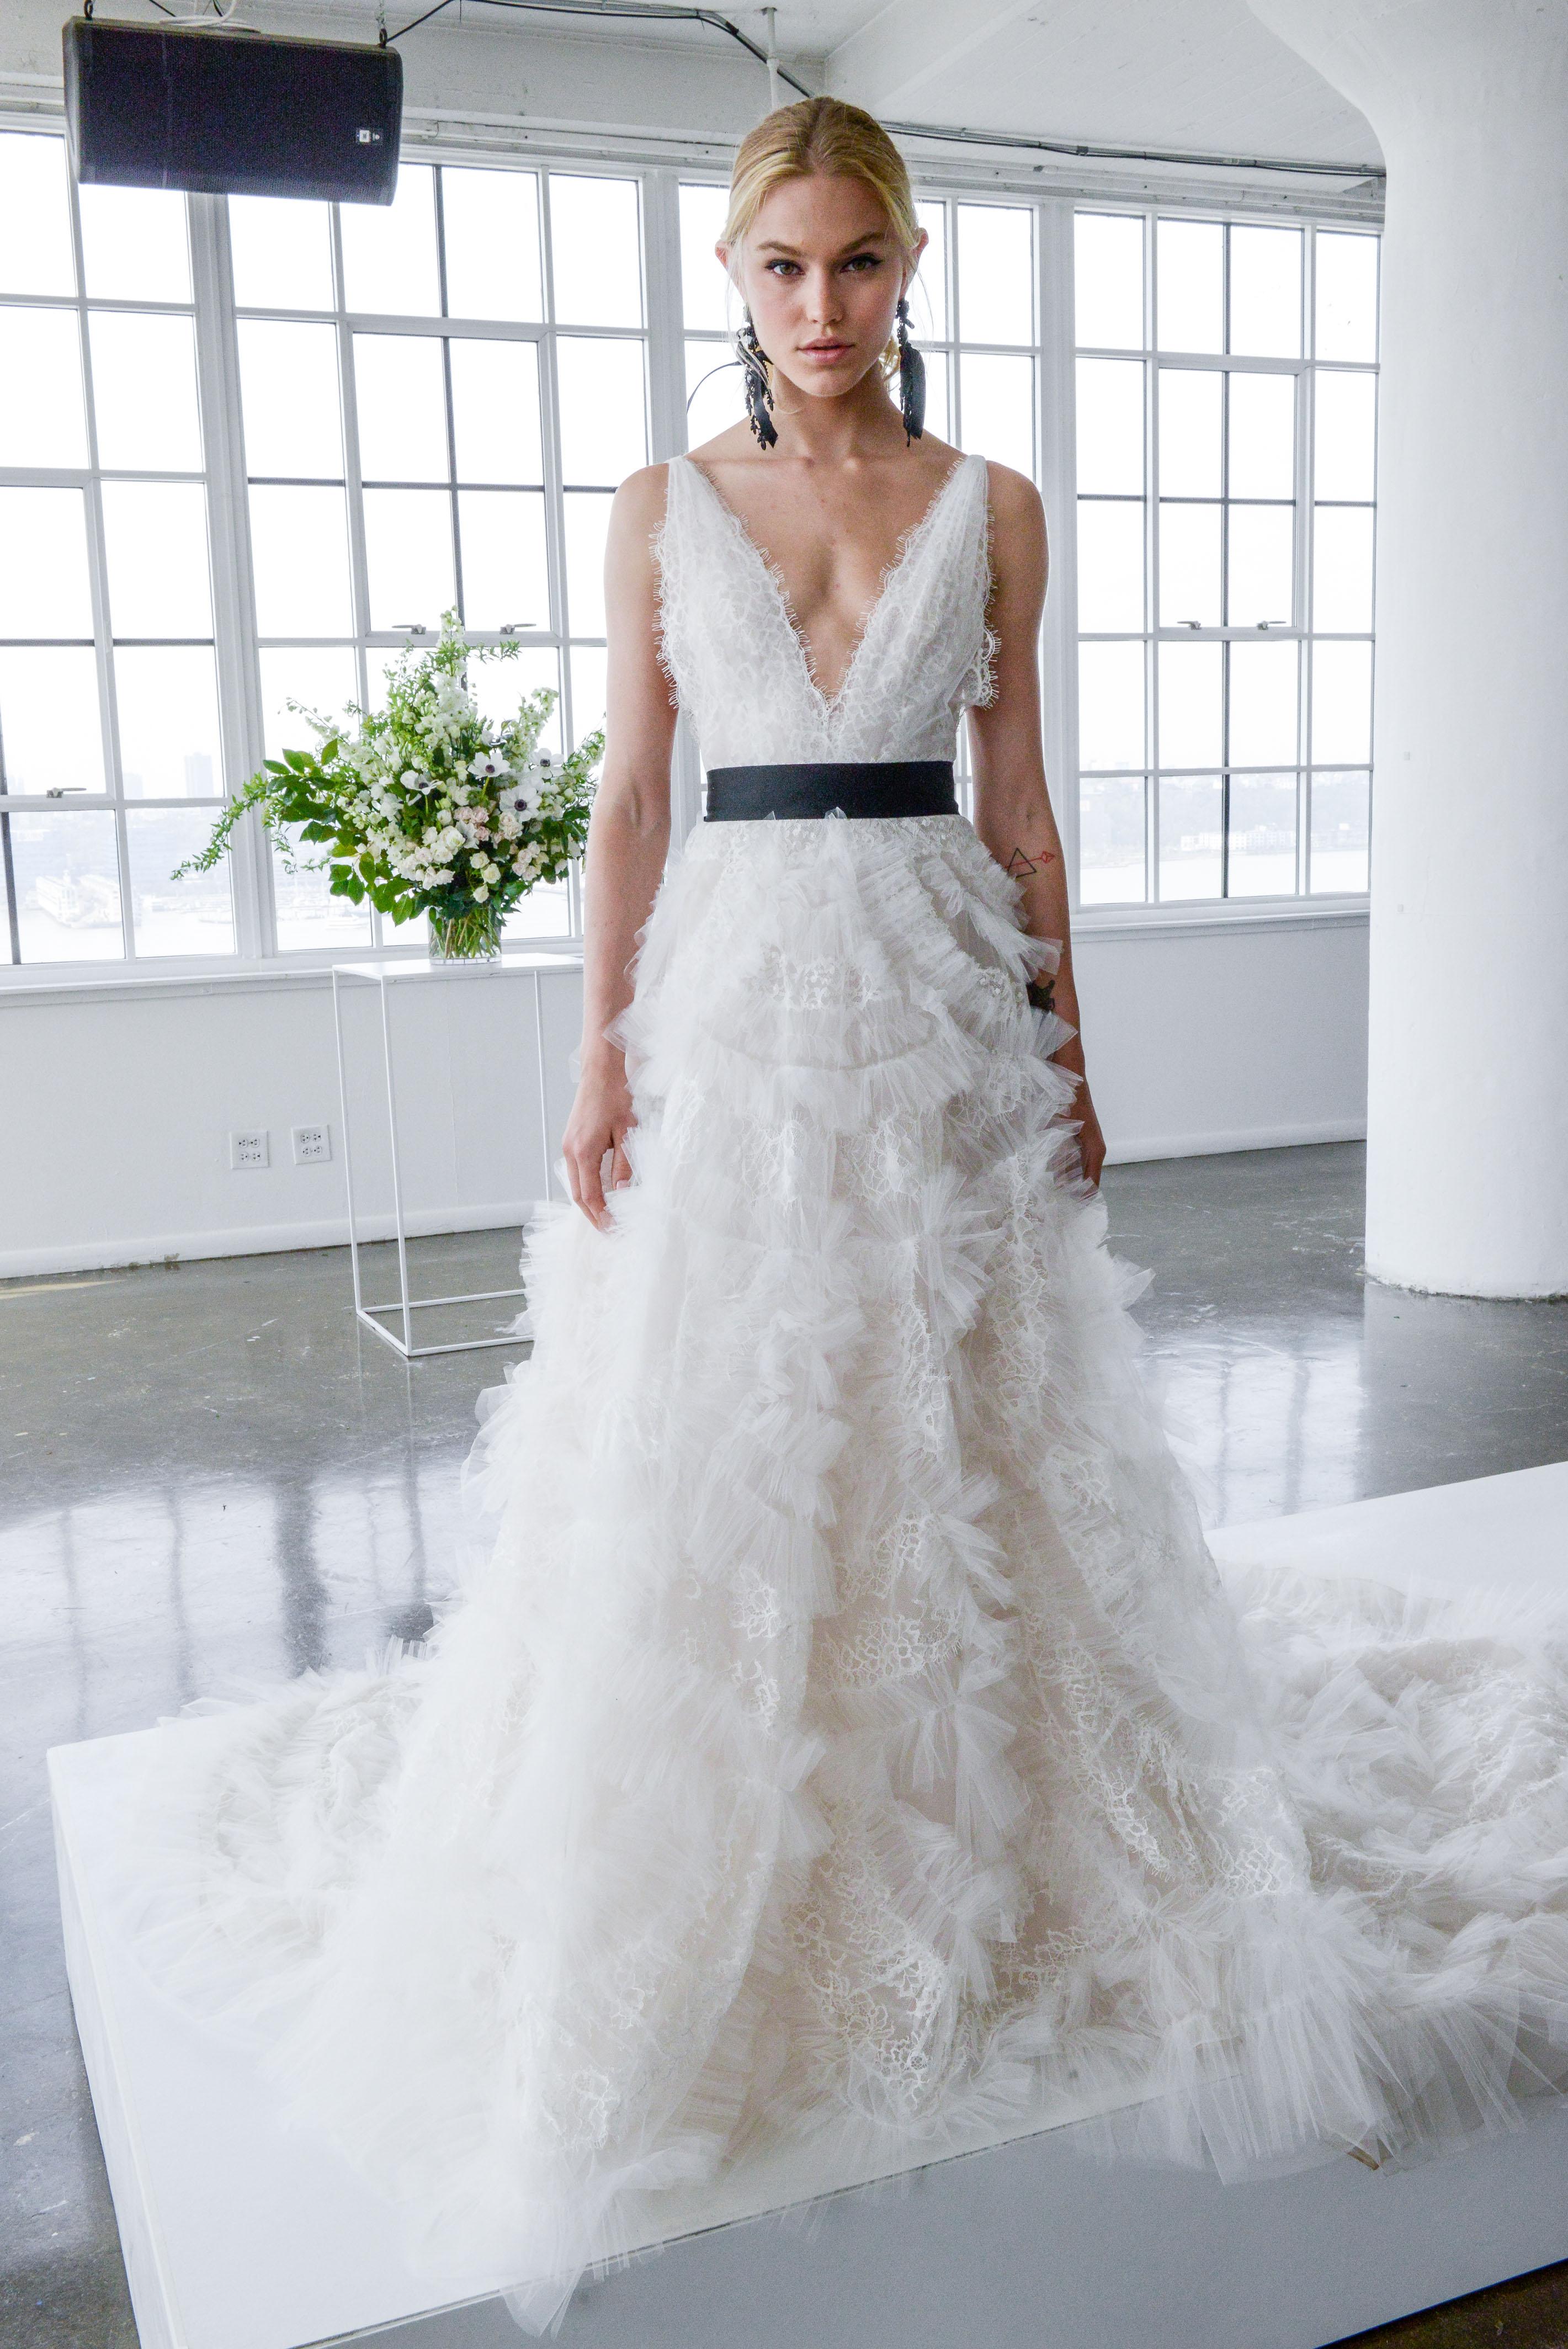 marchesa spring 2018 a-line wedding dress with ruffled skirt